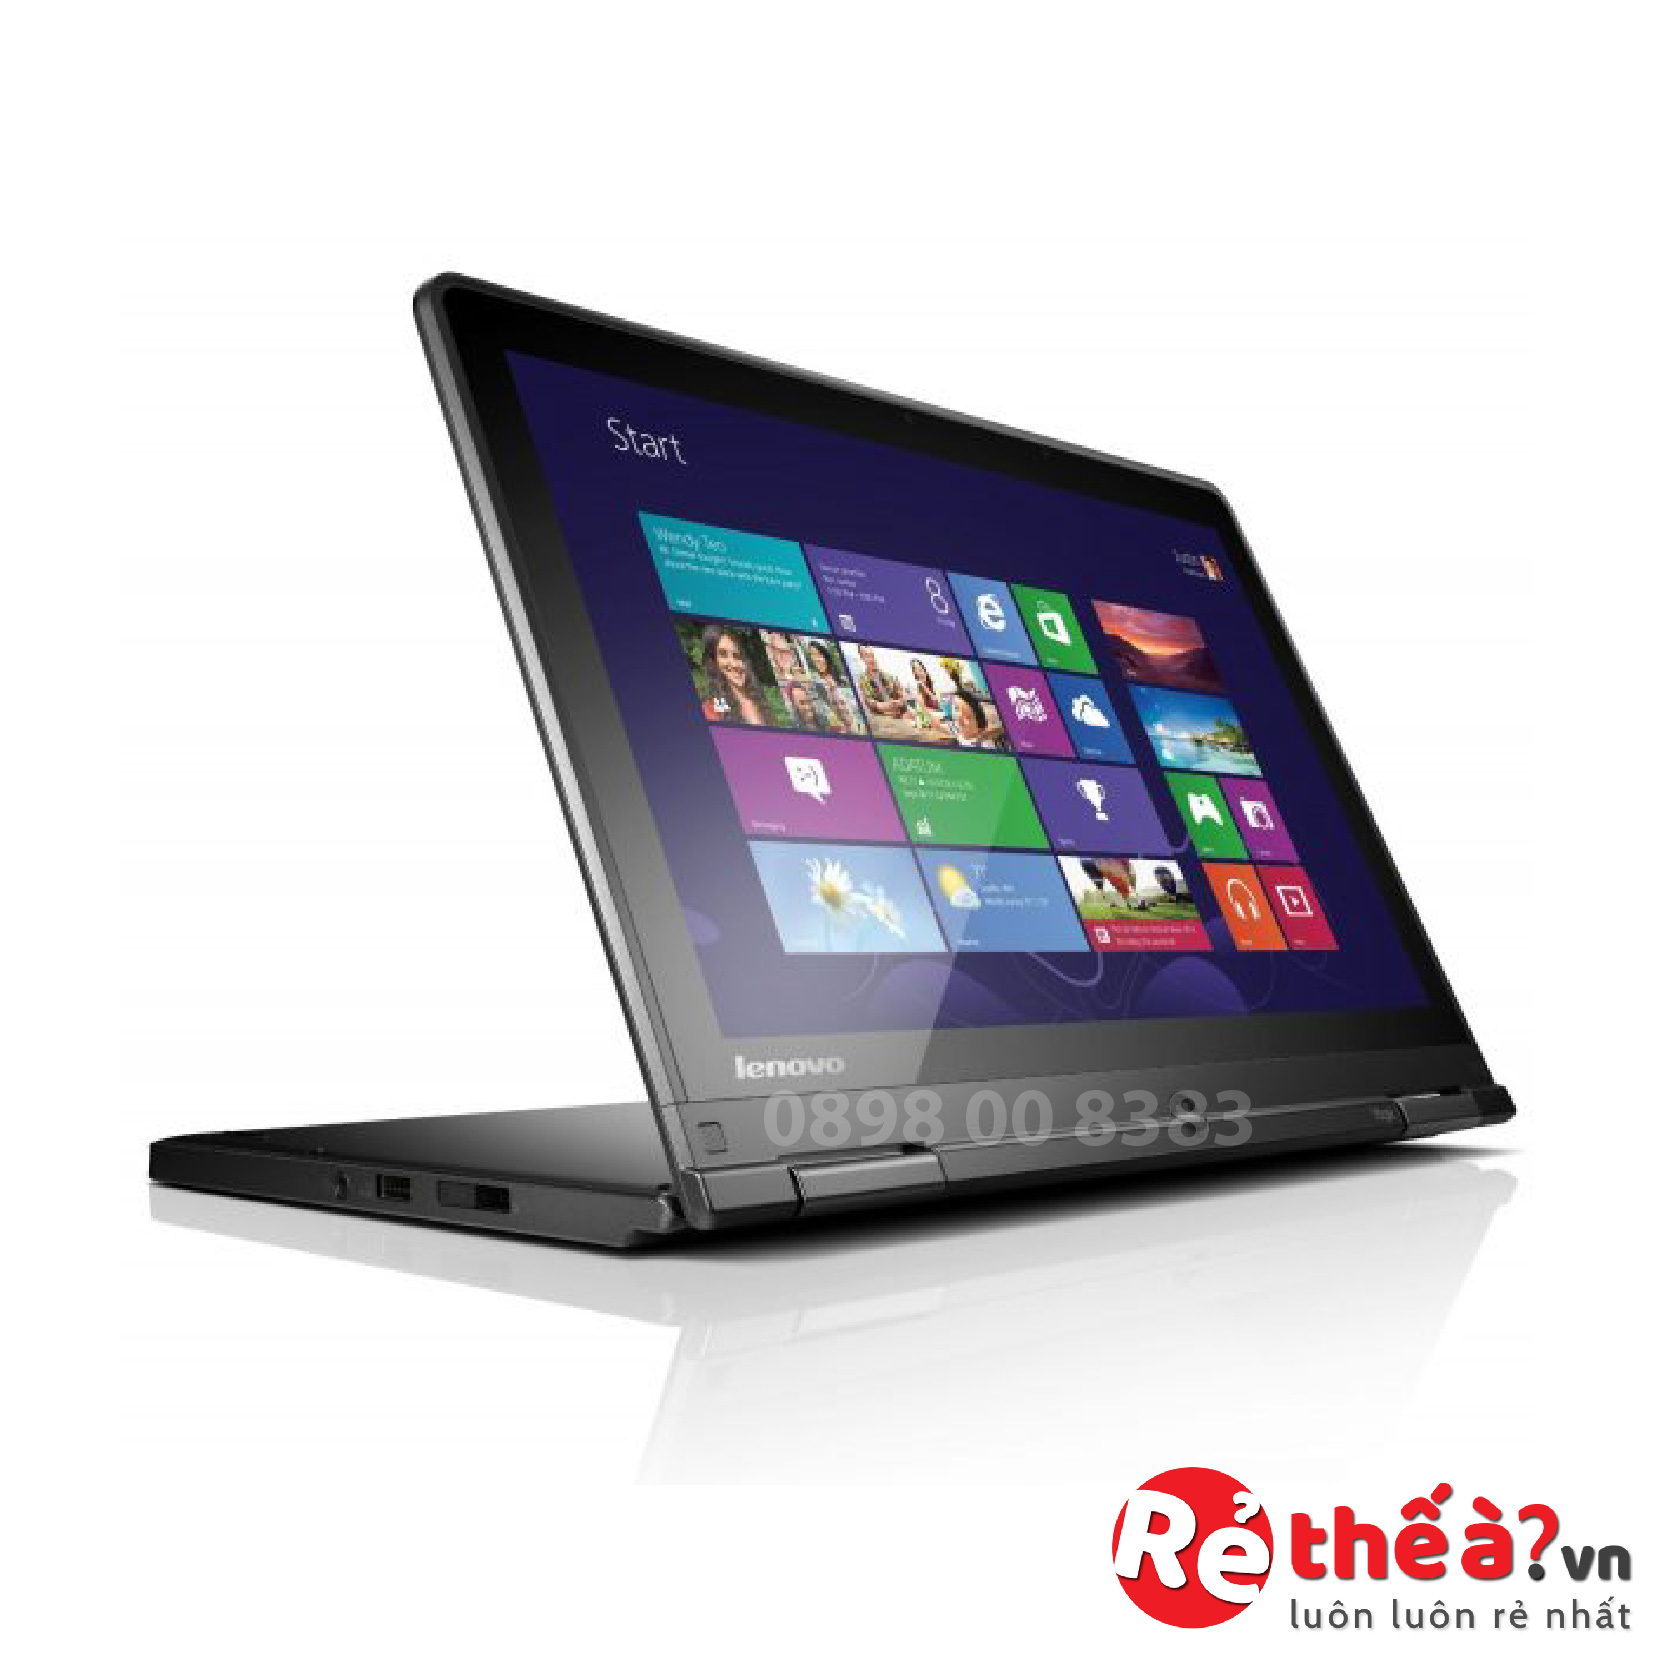 Laptop Lenovo Thinkpad Yoga S1